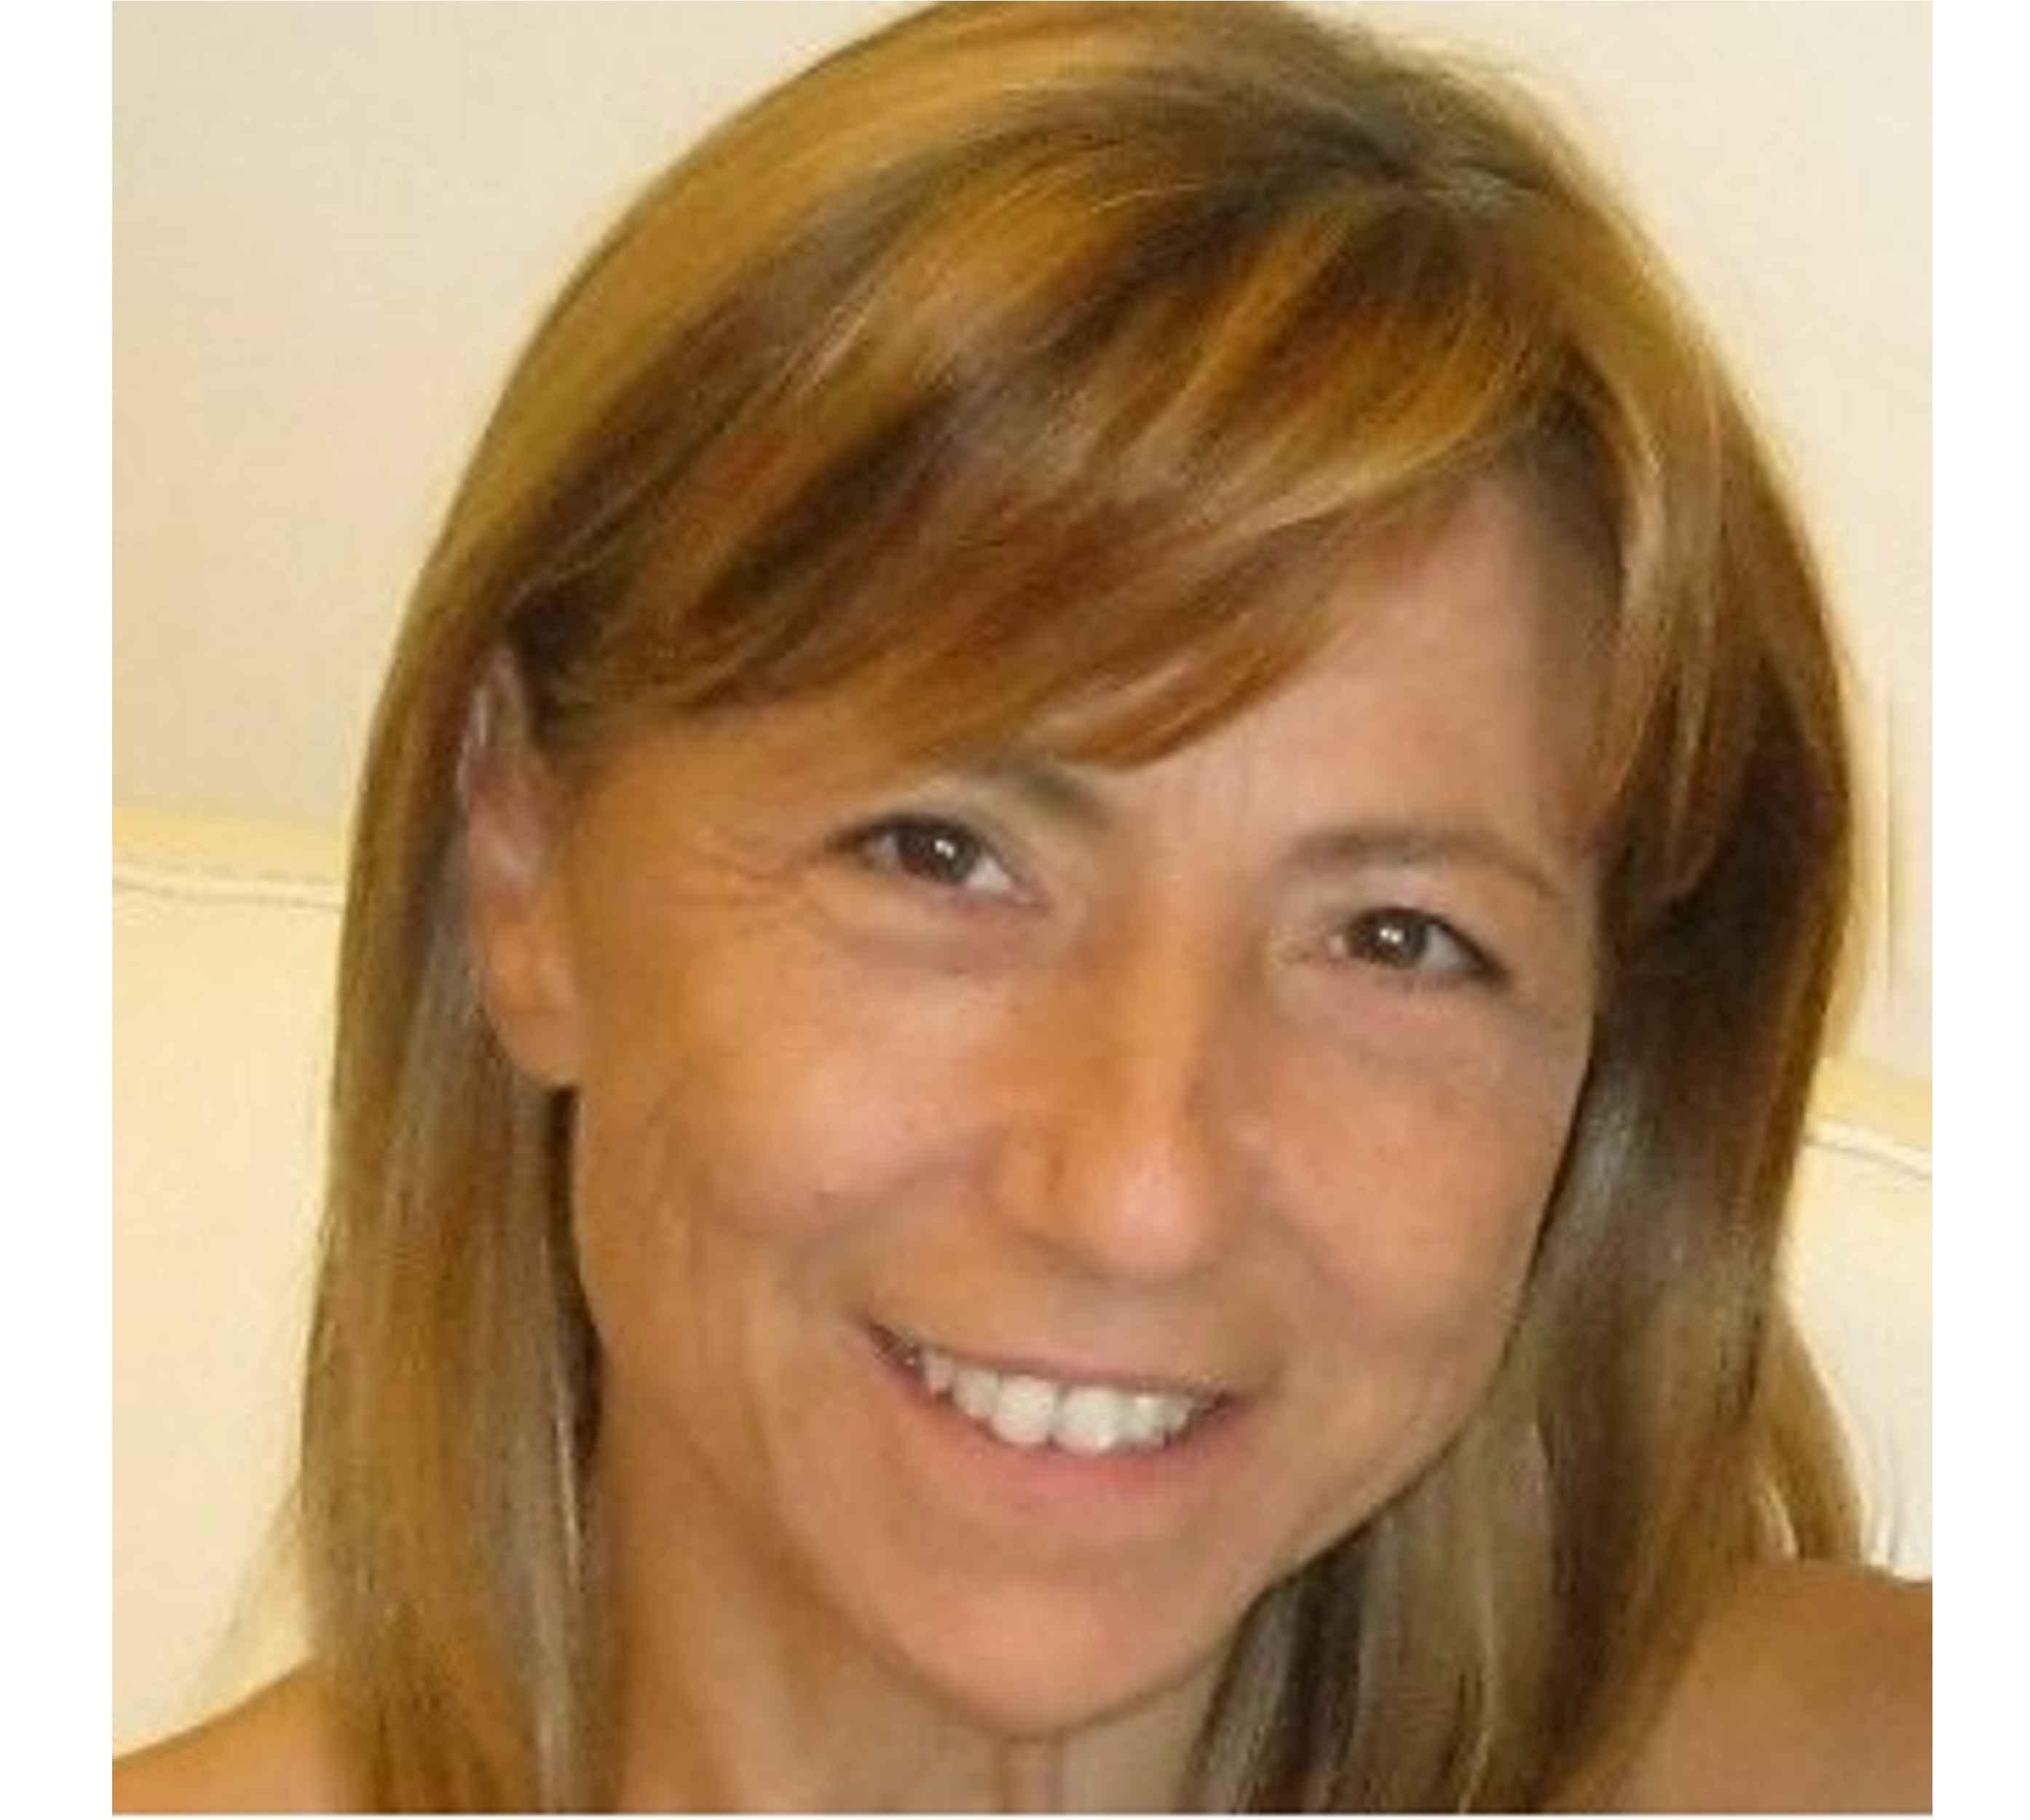 Dott. ssa Assunta Santonati